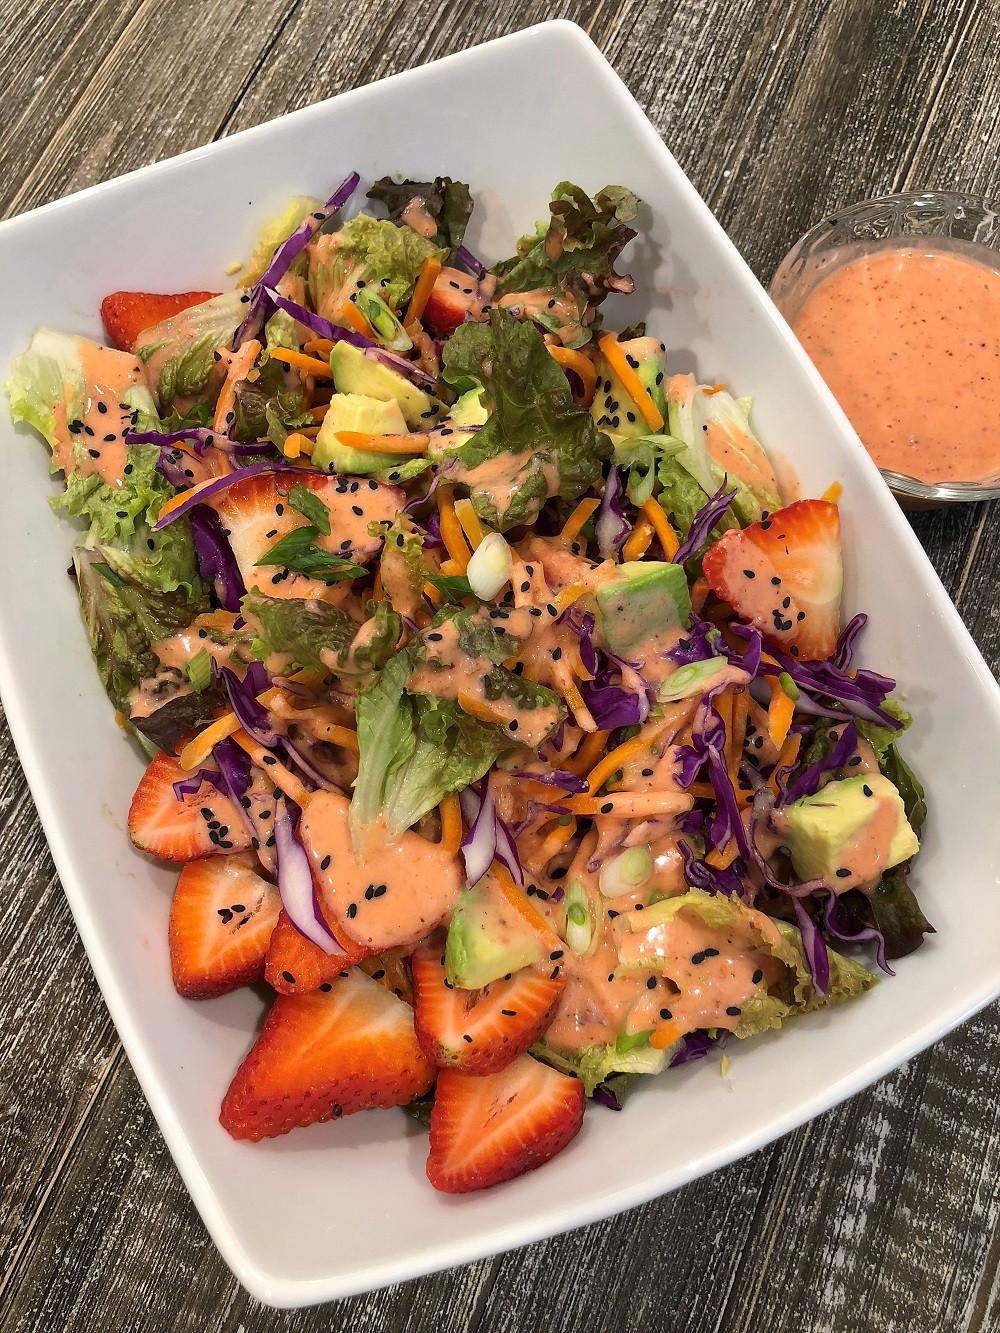 Dairy Free Salad Dressings  Best Gluten Free Strawberry Salad Dressing